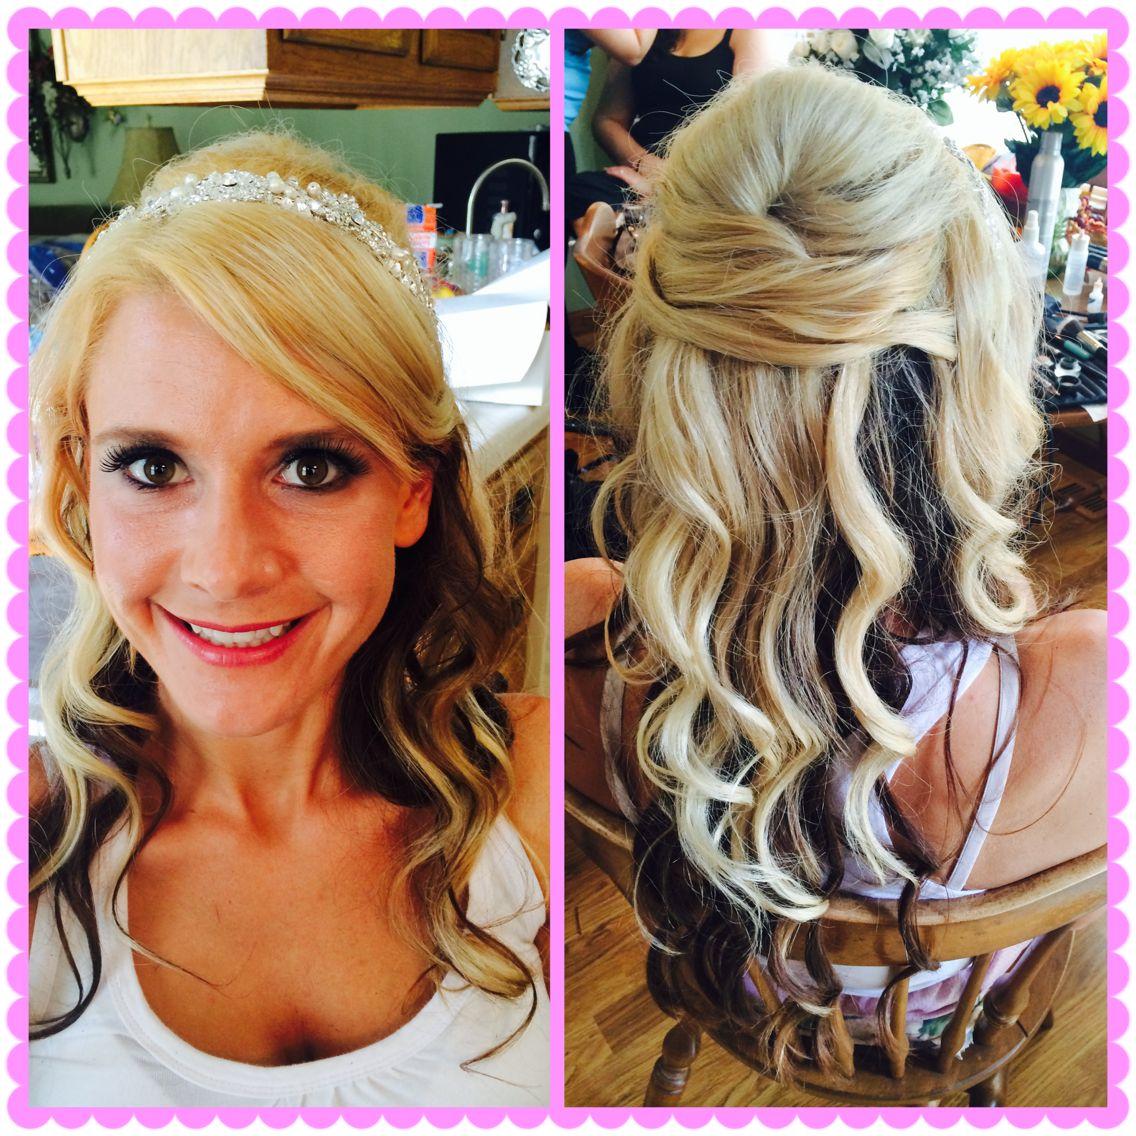 #bridalpartyhairandmakeup #makeupnmore www.make-up-n-more.com